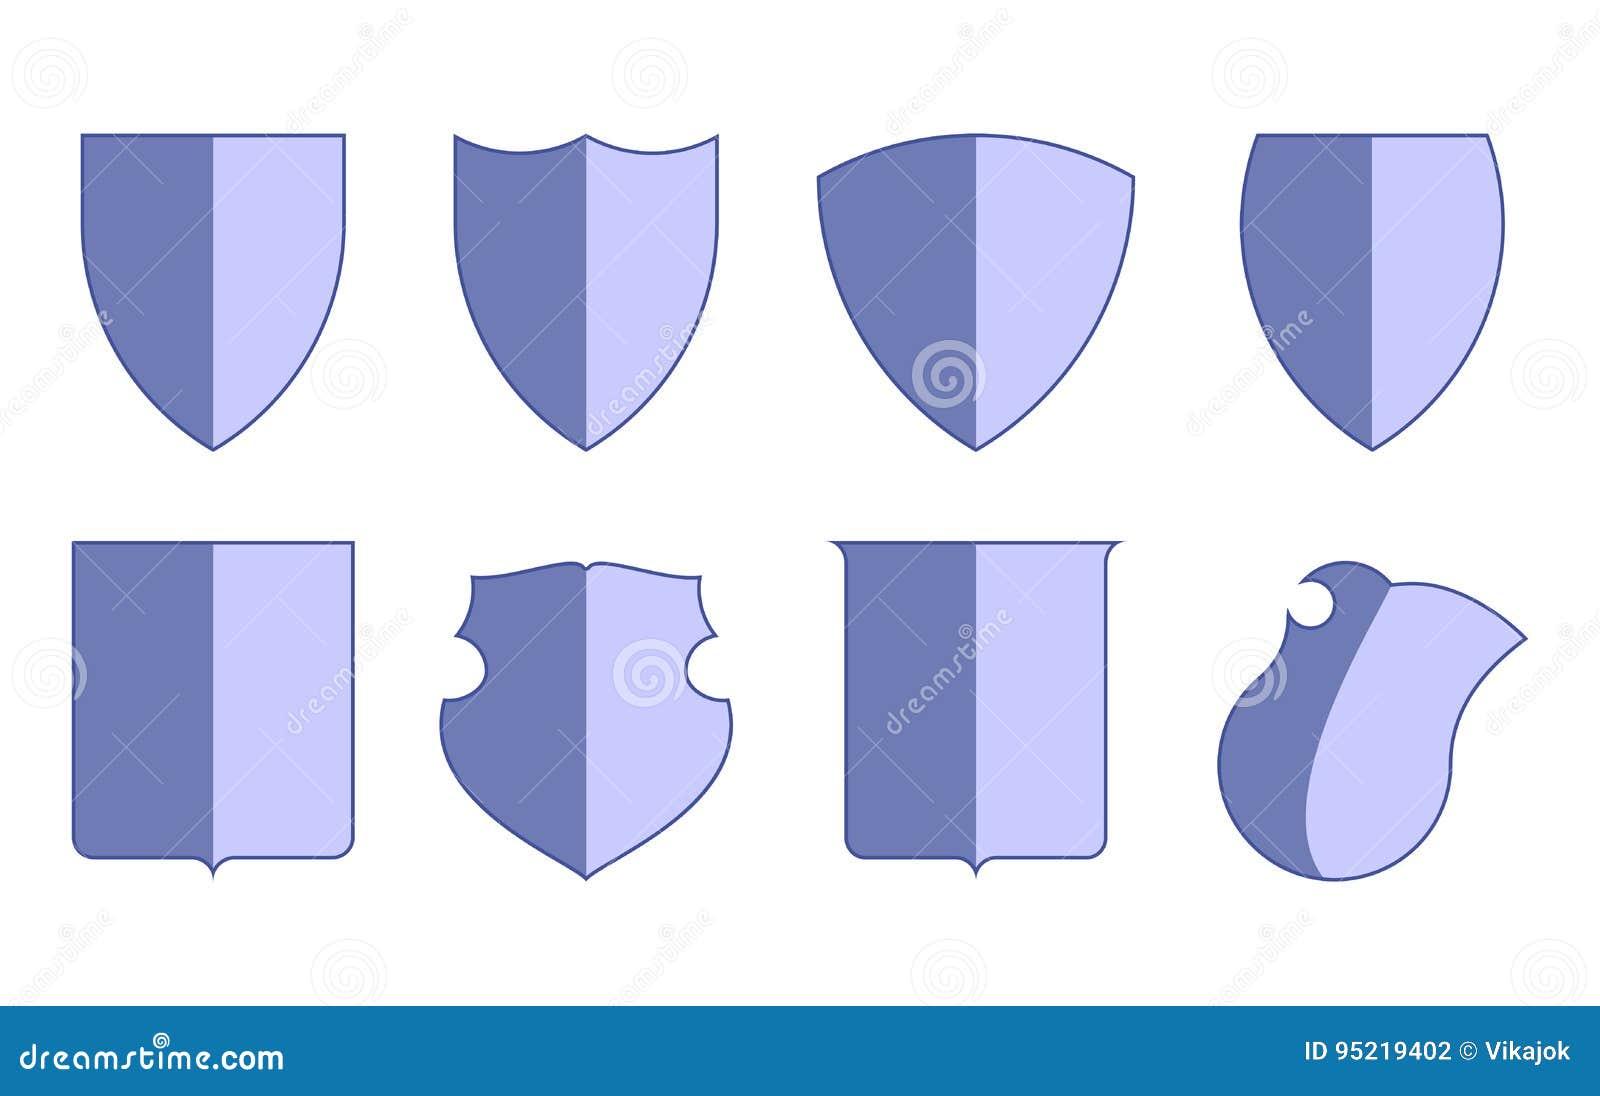 Shield outline coat arms clipart panda free clipart images - Badge Outline Clip Art At Clker Com Vector Clip Art Online